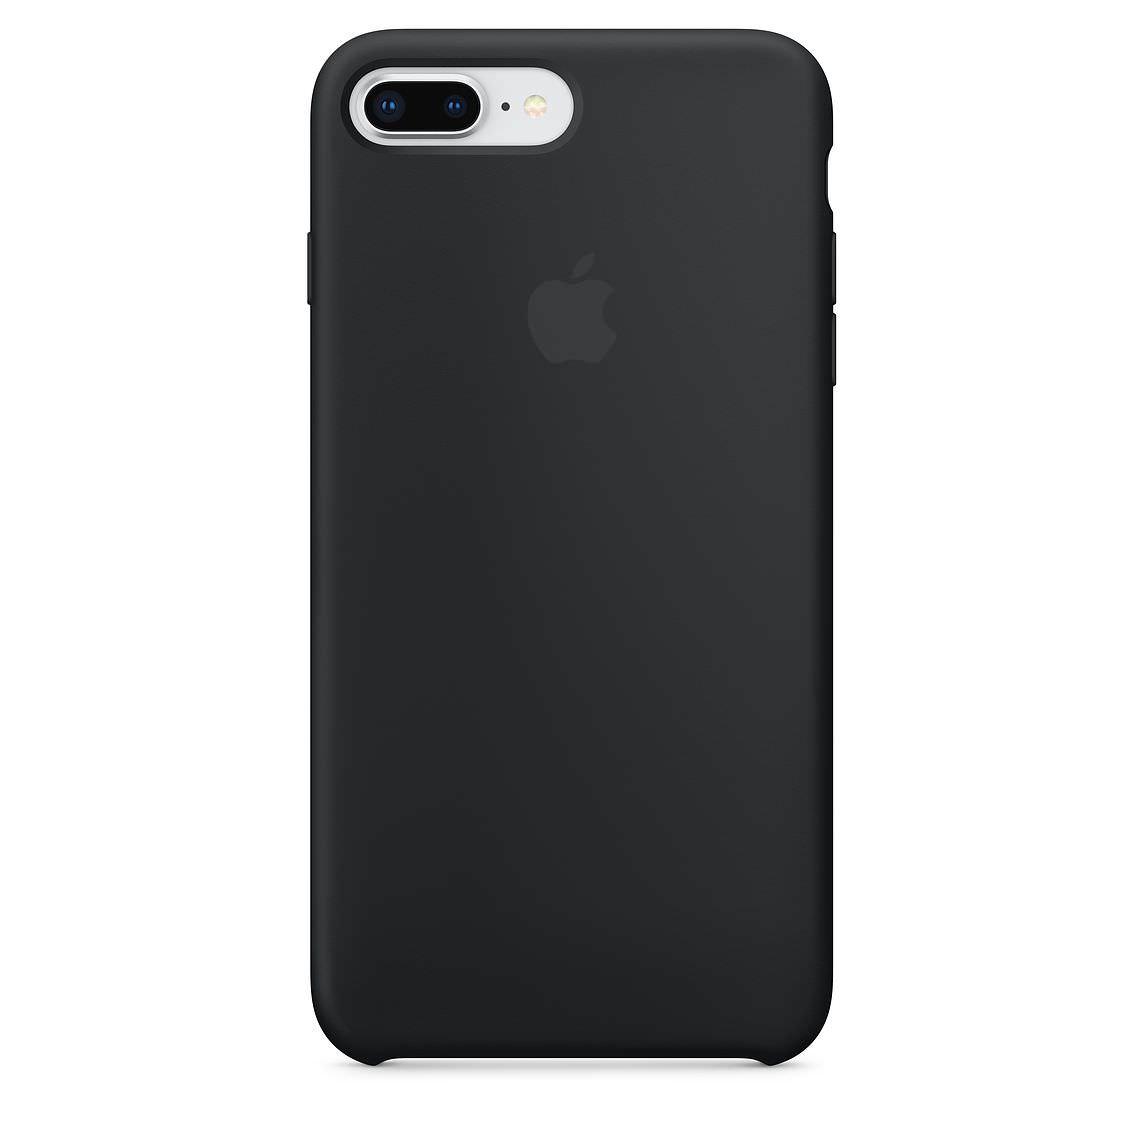 Apple silikónový obal pre iPhone 7 Plus / 8 Plus - čierny 1